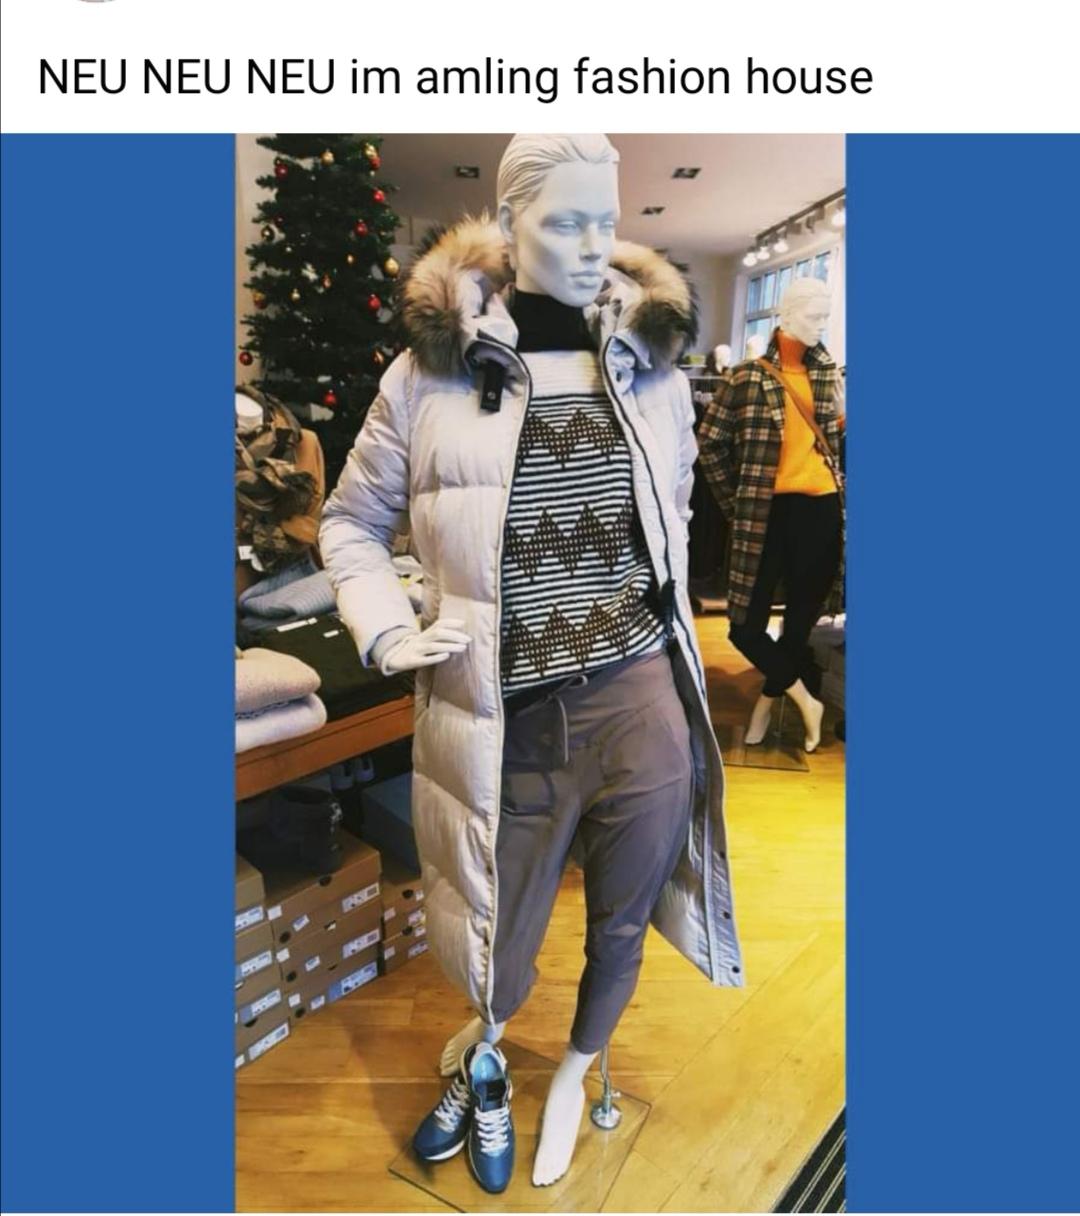 neu im amling fashion house